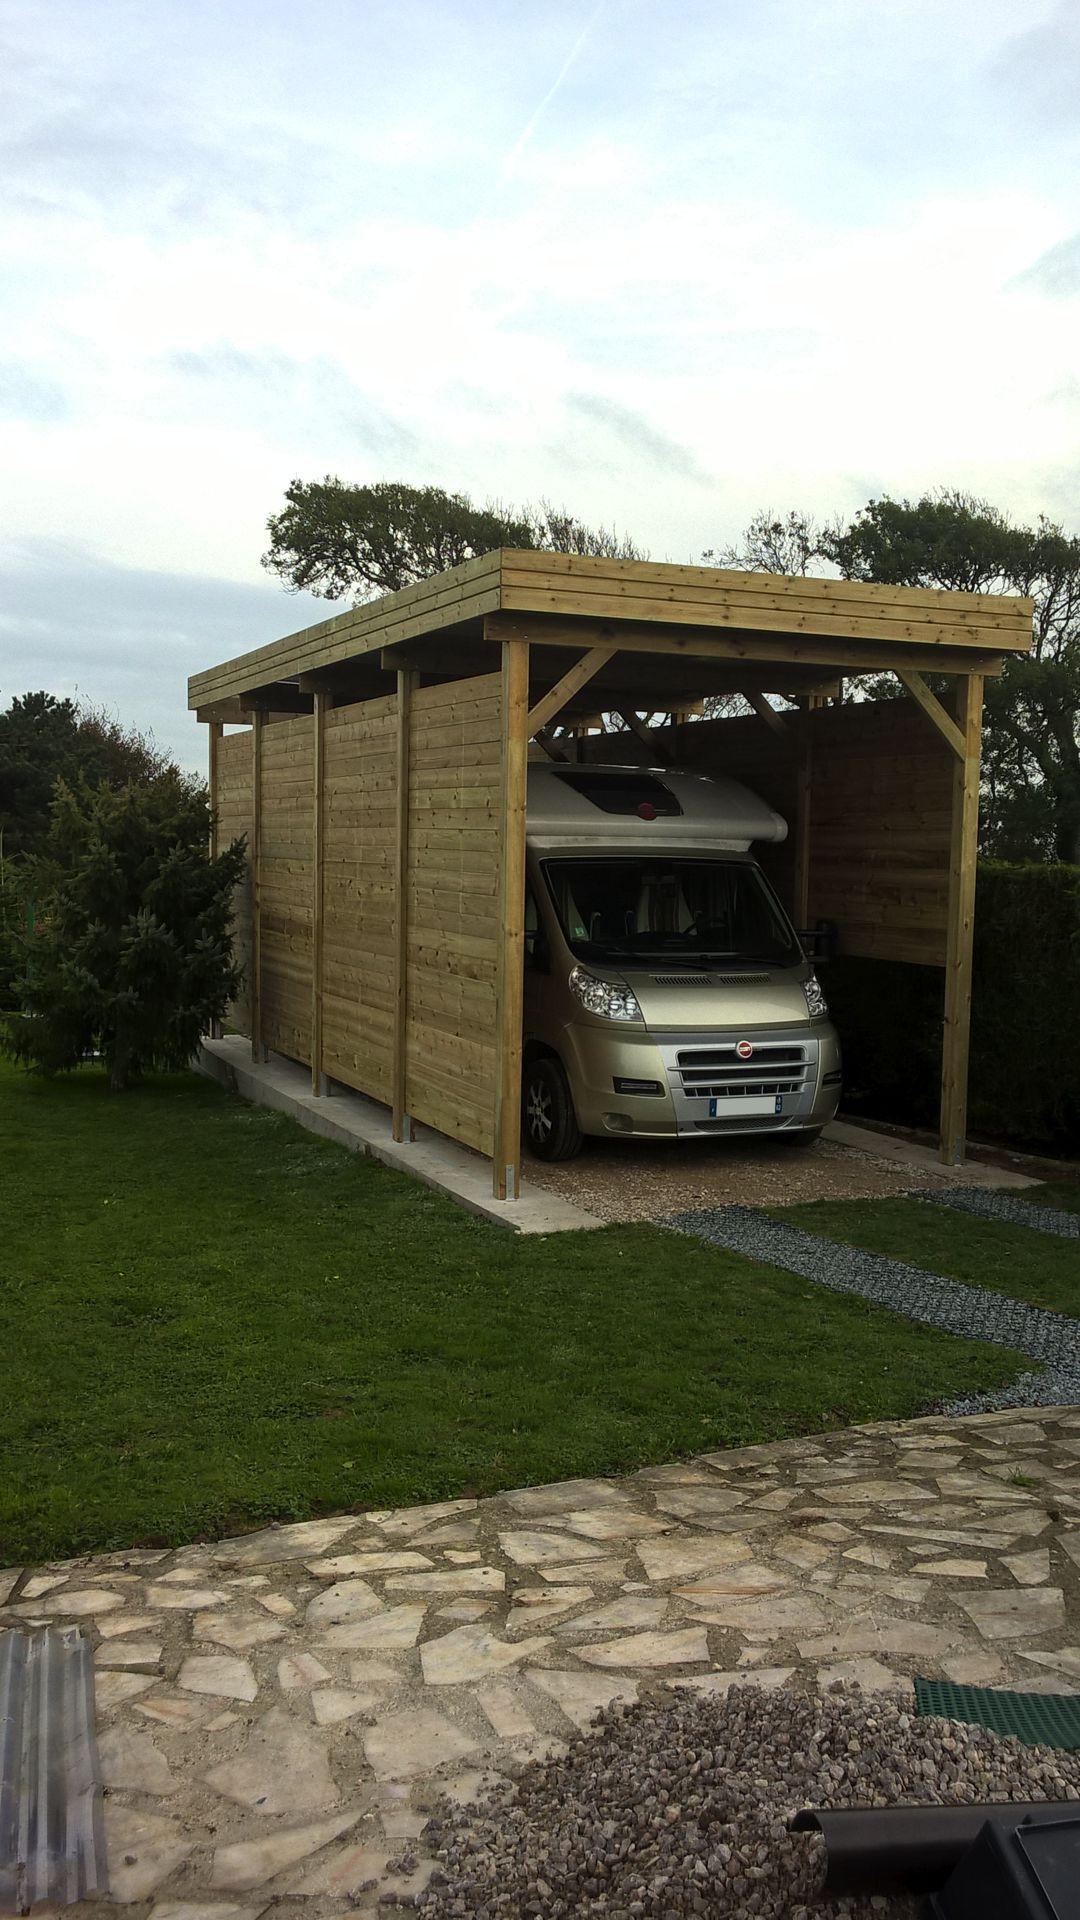 Carport sur mesure pour mobilhome-camping car